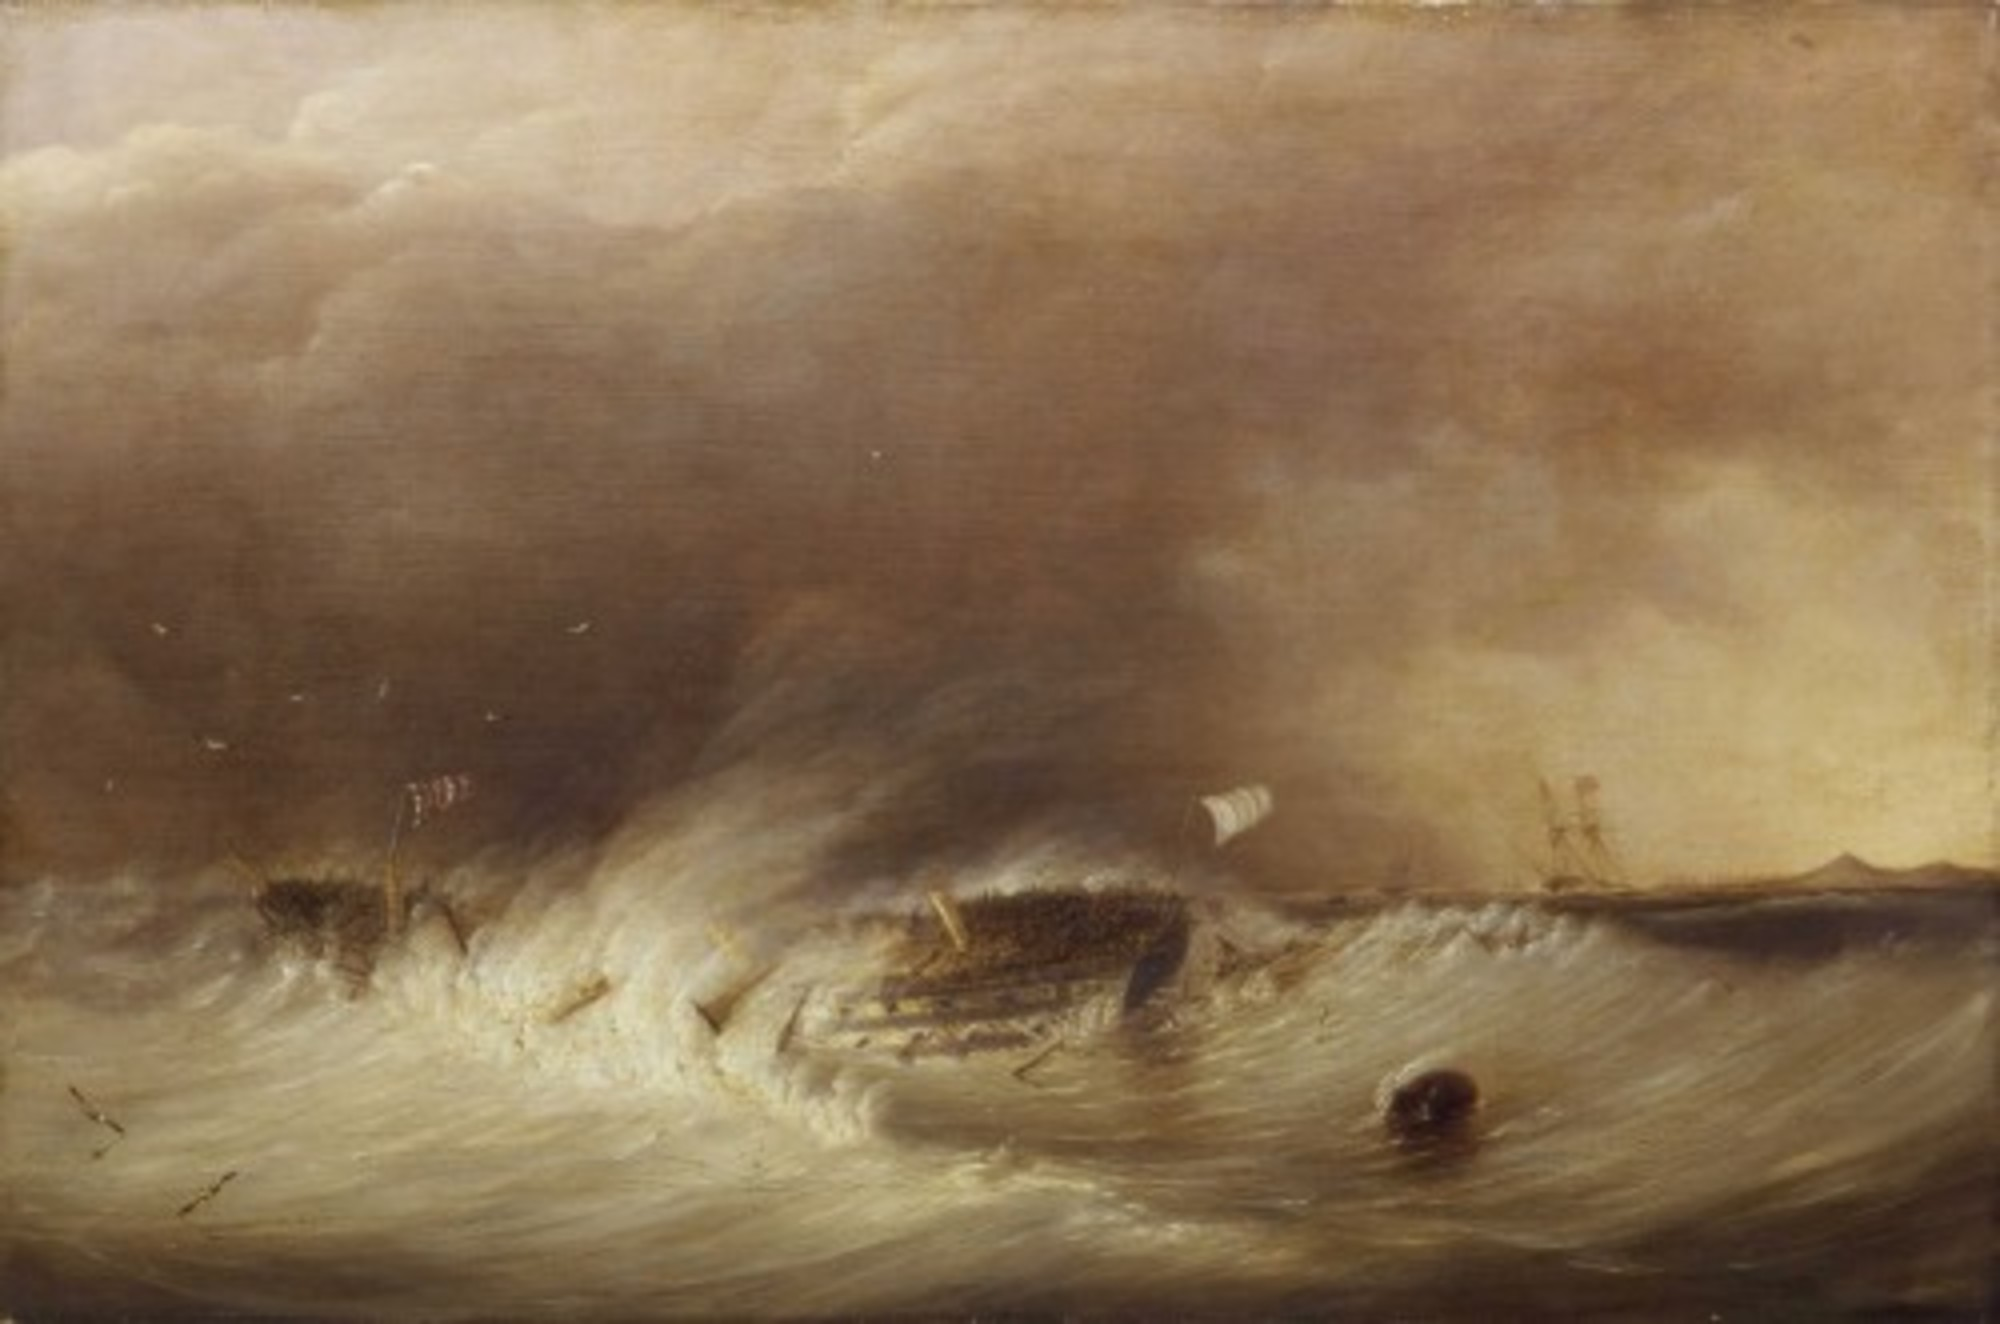 The-wreck-of-HMS-Hero-in-the-Texel-25-December-1811-RMG-BHC3401.jpg